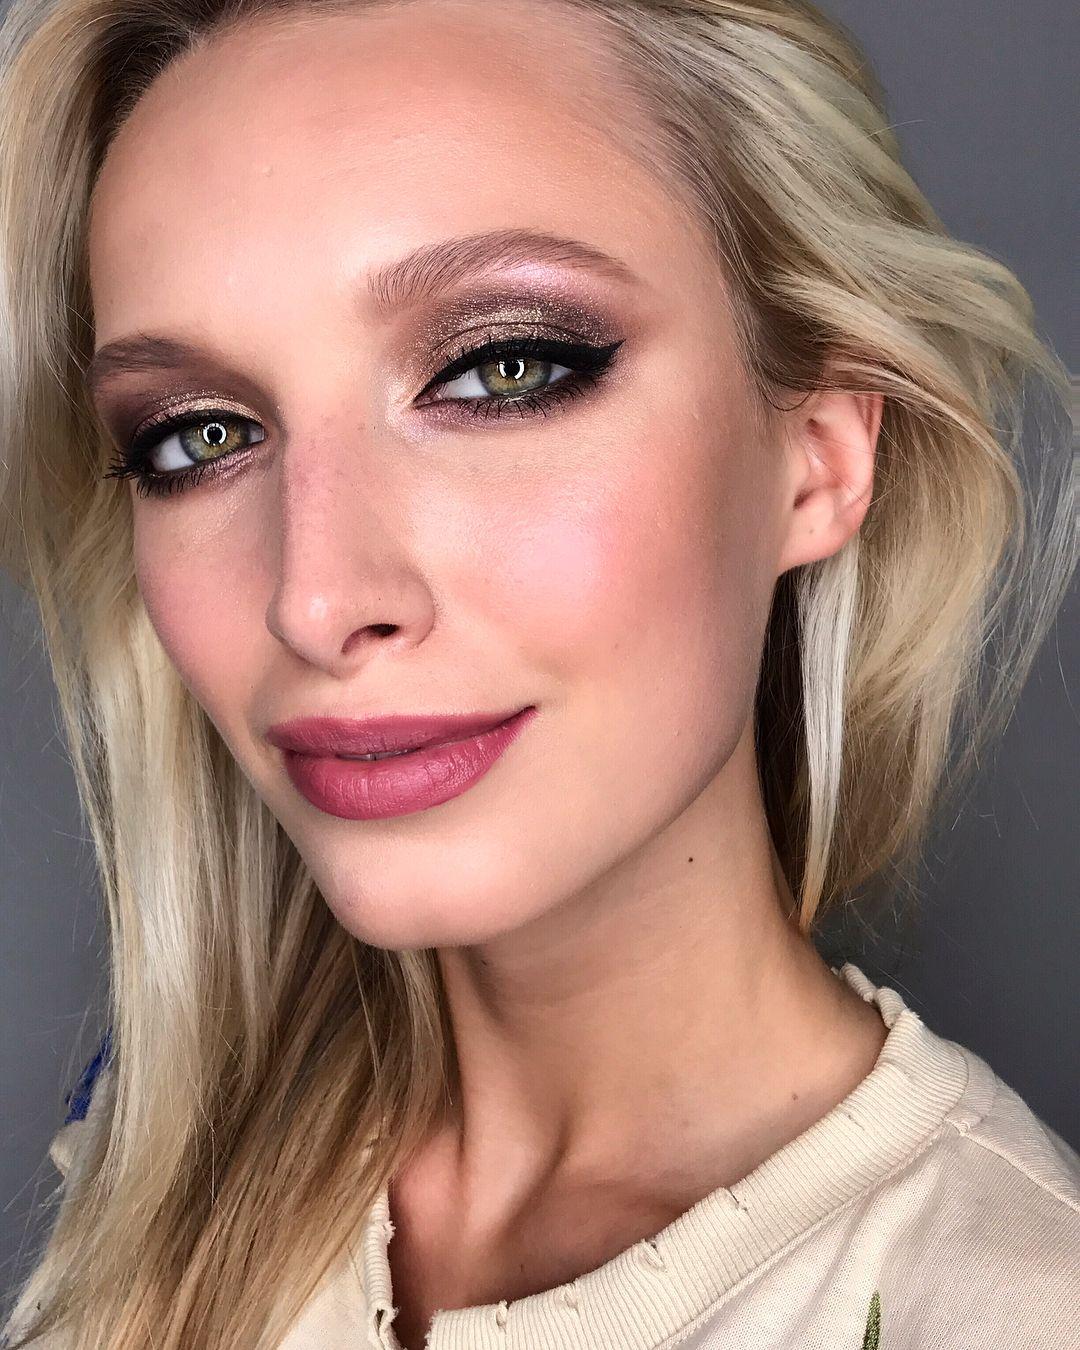 Pin by 𝑚𝑖𝑎 ♡࿐ * ゚. on bARK BARK ☻︎   Cute makeup